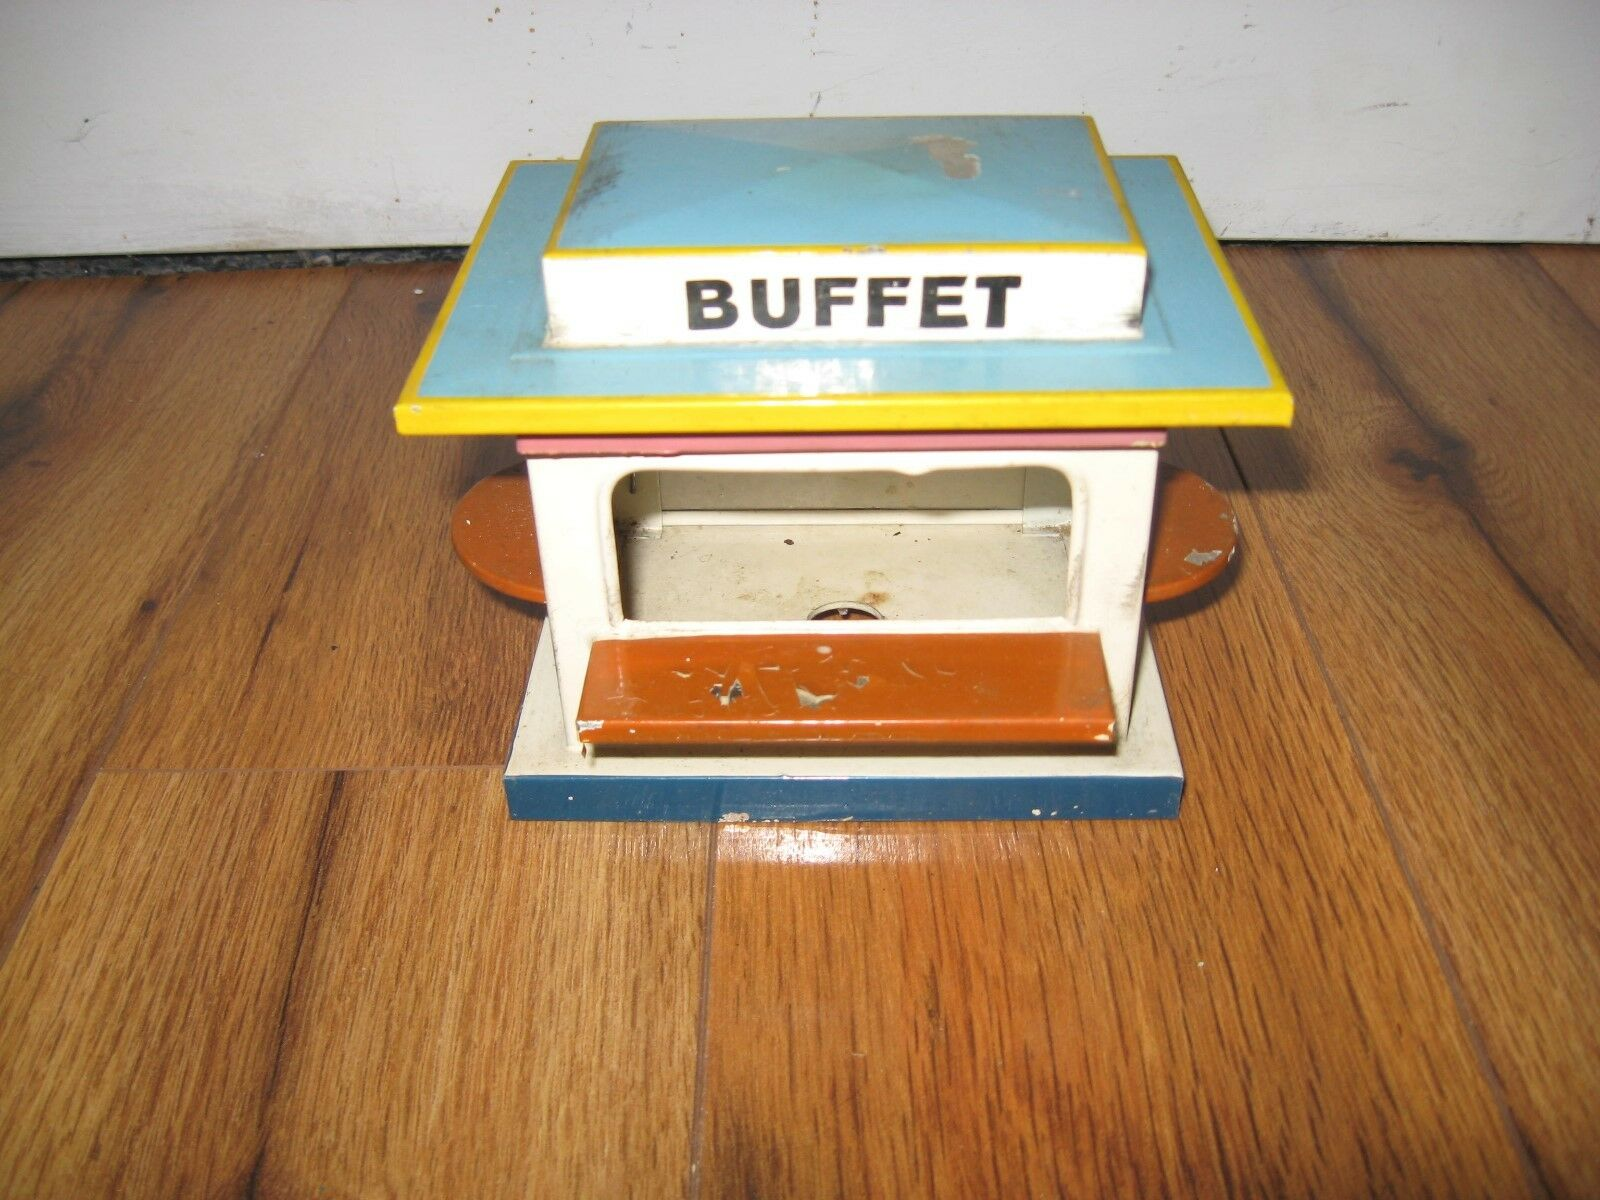 Bing O Gauge Buffet Station Stand Antique Rare Prewar Kiosk Marklin Kibri Bub